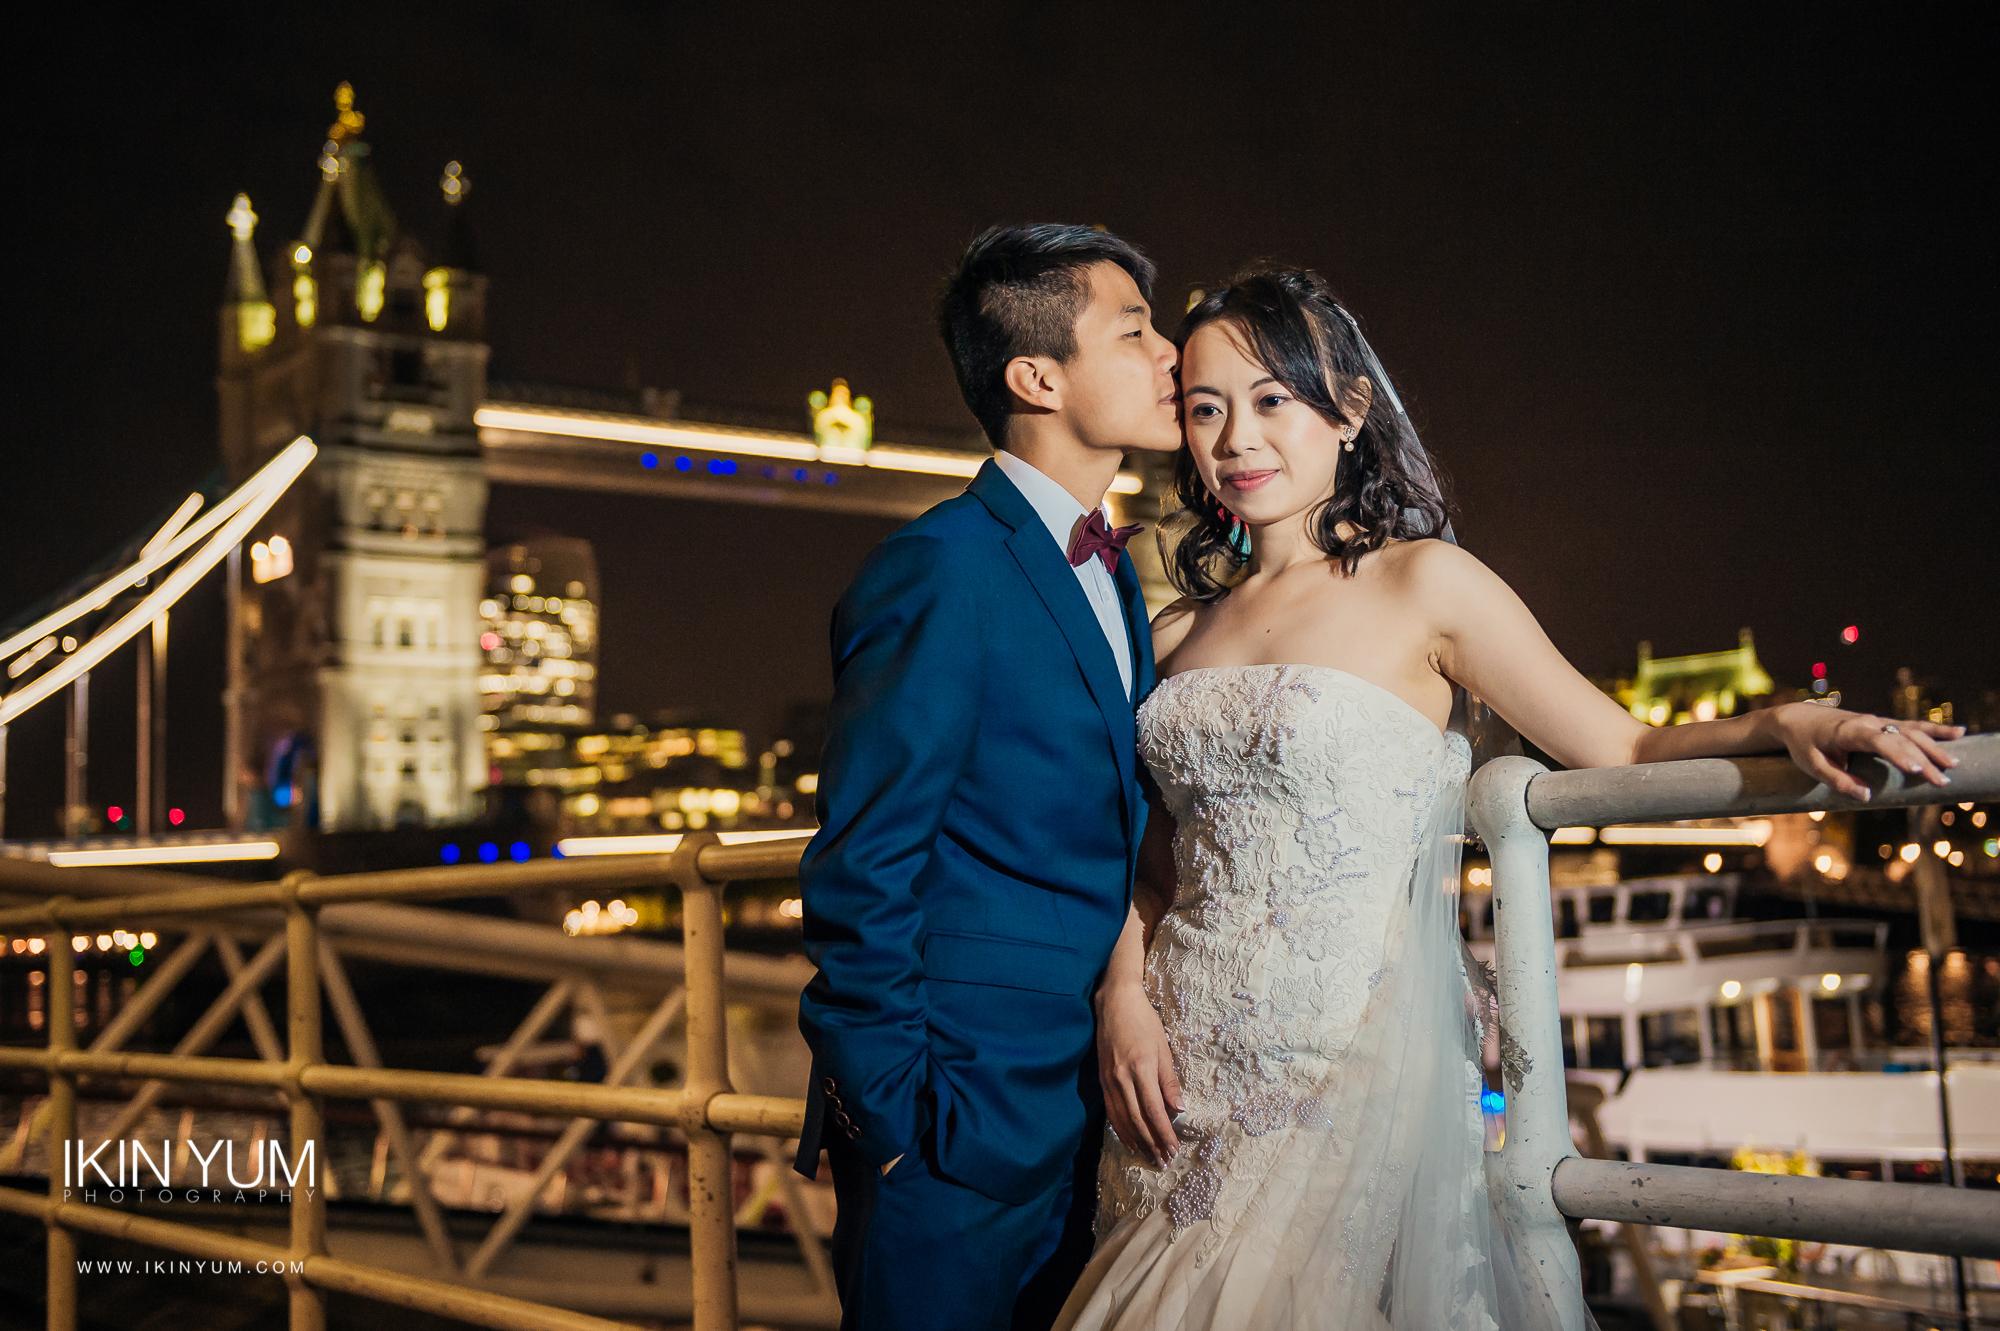 Chloe & Carlos Pre-Wedding Shoot- Ikin Yum Photography-0170.jpg